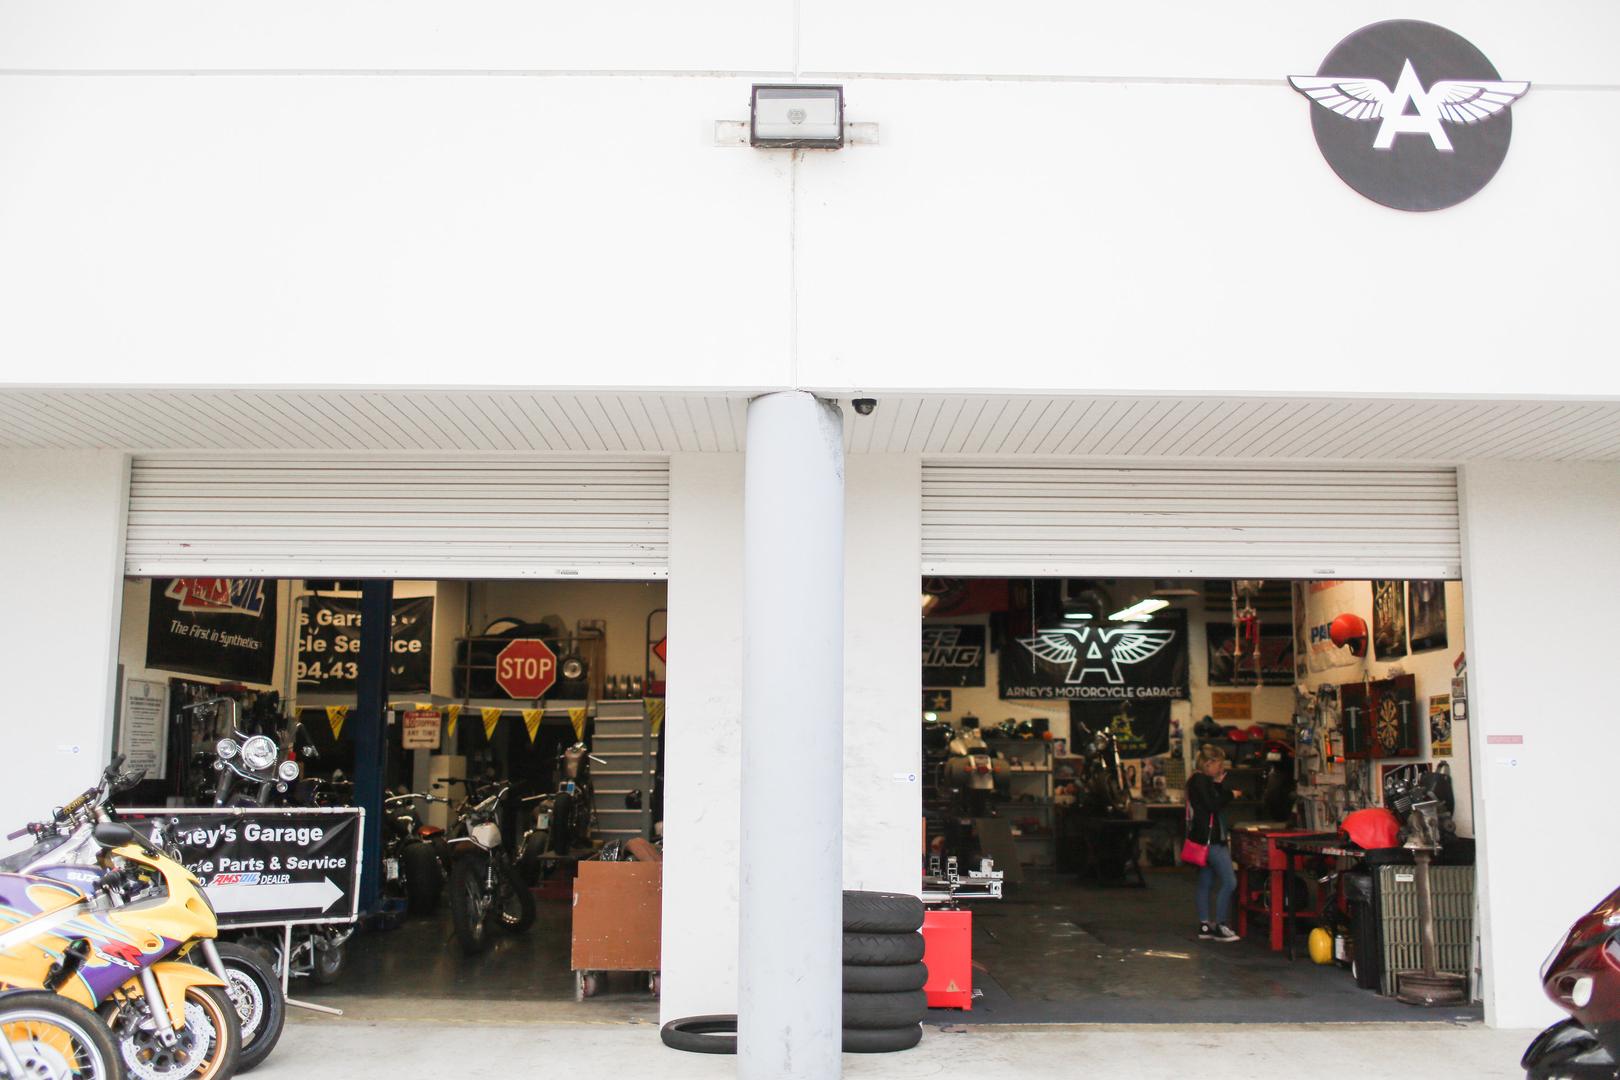 Arneys Motorcycle Garage Repair Service Honda Shop In Murrieta Offers Maintenance And By Factory Certified Technicians